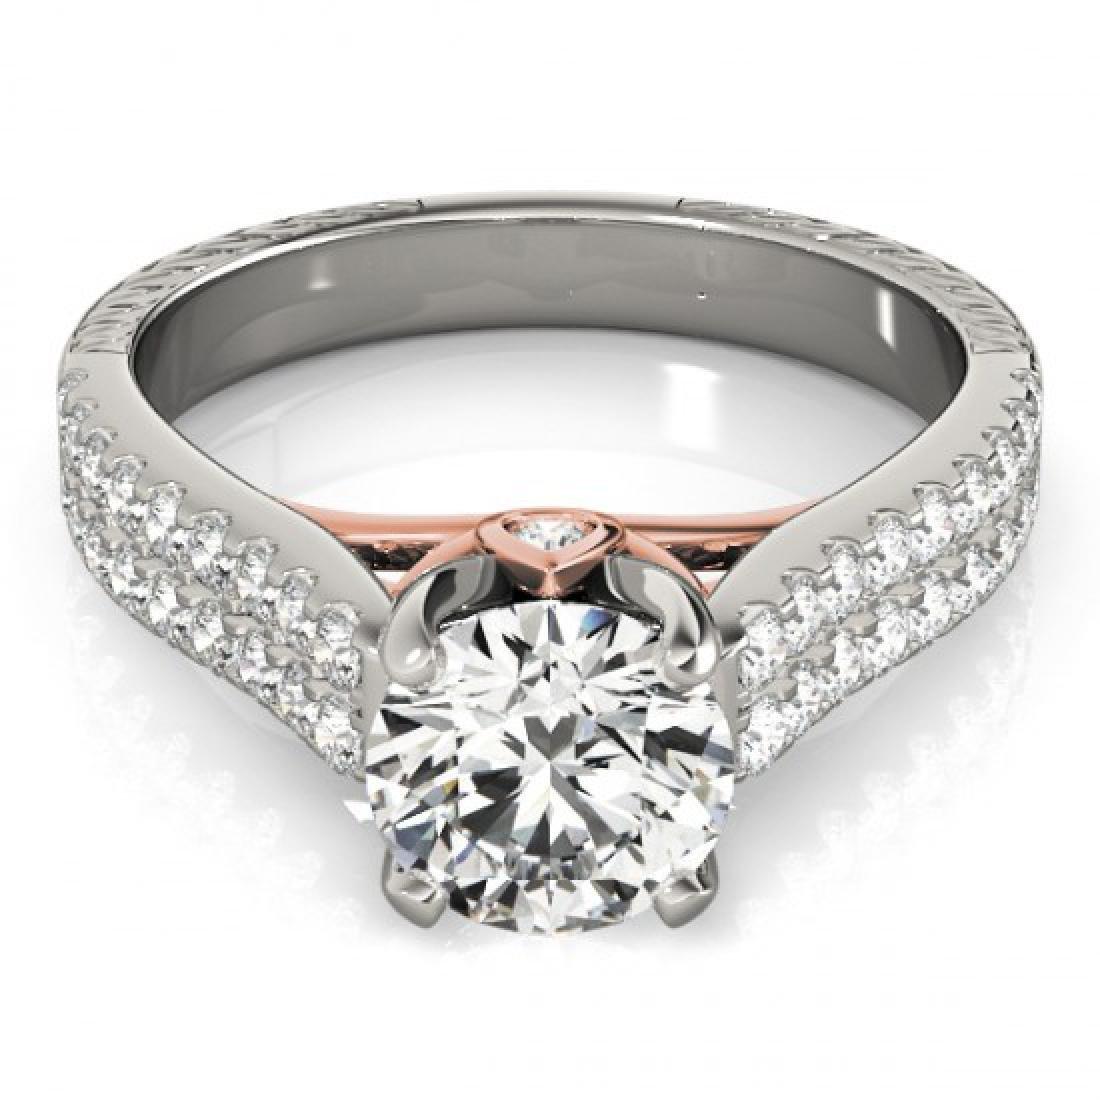 1.36 CTW Certified VS/SI Diamond Pave Ring 14K White &